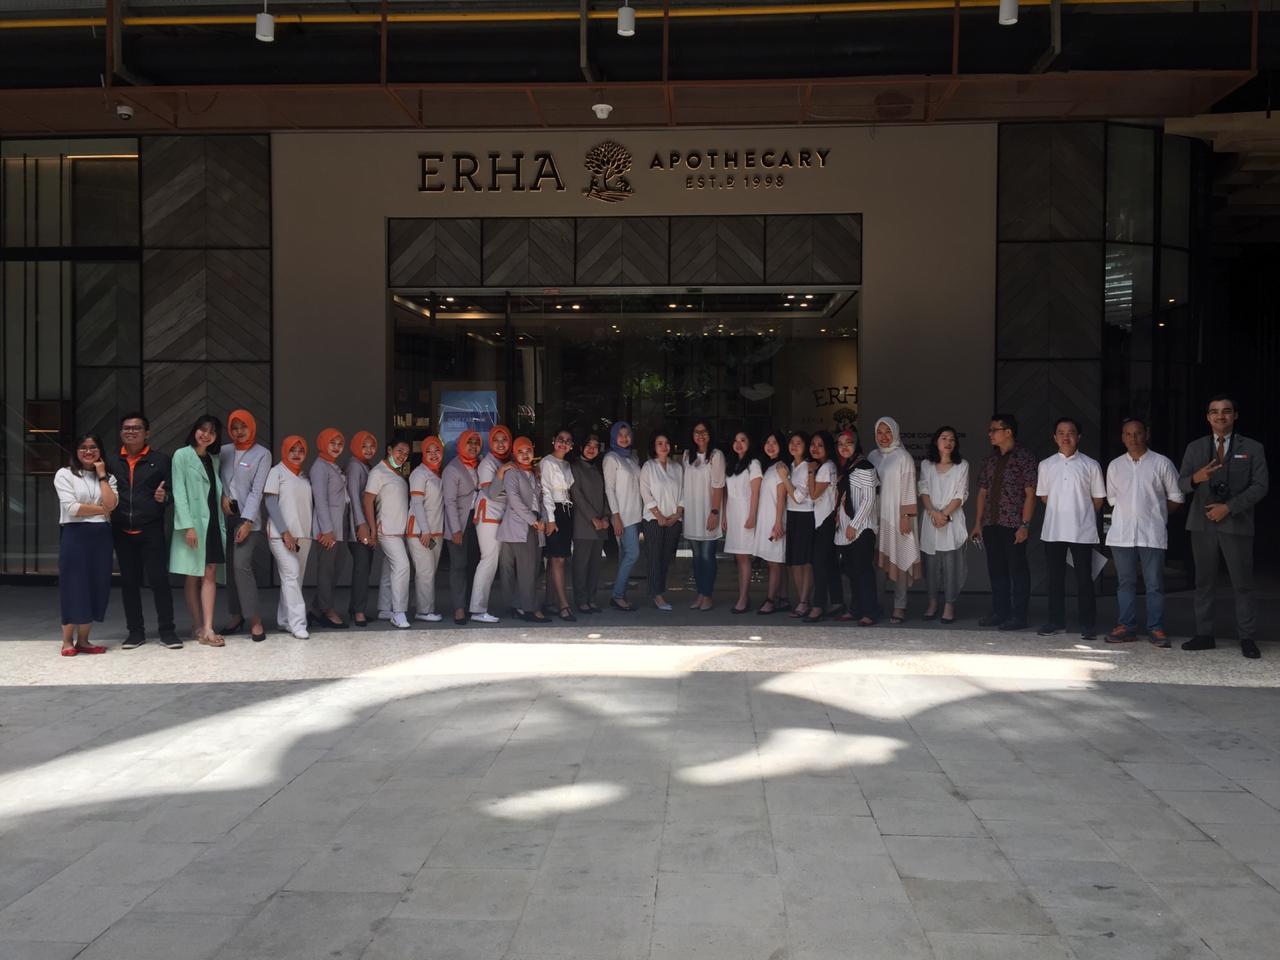 THE NEW 93RD ERHA BRANCH IN MAKASSAR